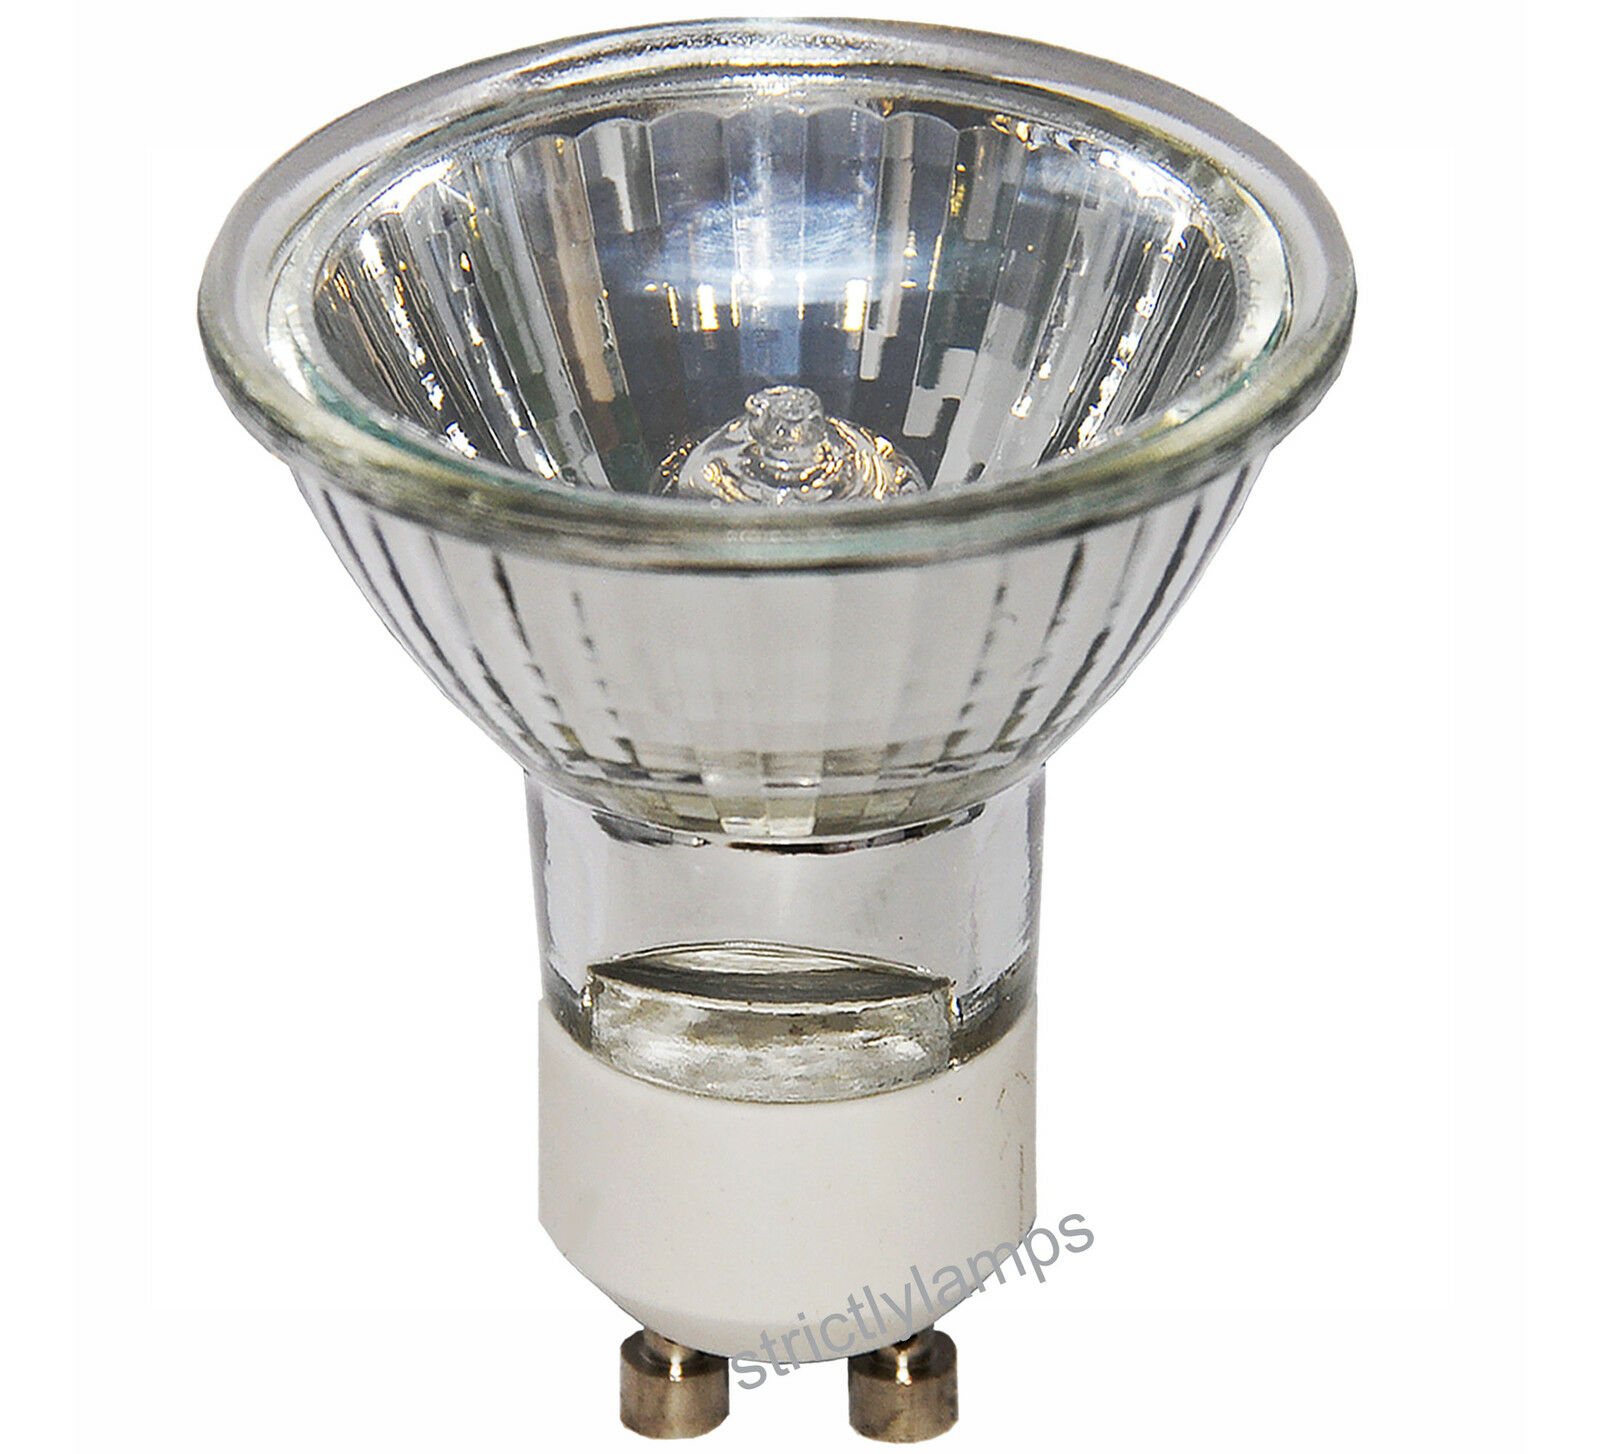 10 Pack Long Life Lamp Co Gu10 Halogen 35w Light Bulbs Long Life Gu10 Lamp New Ebay